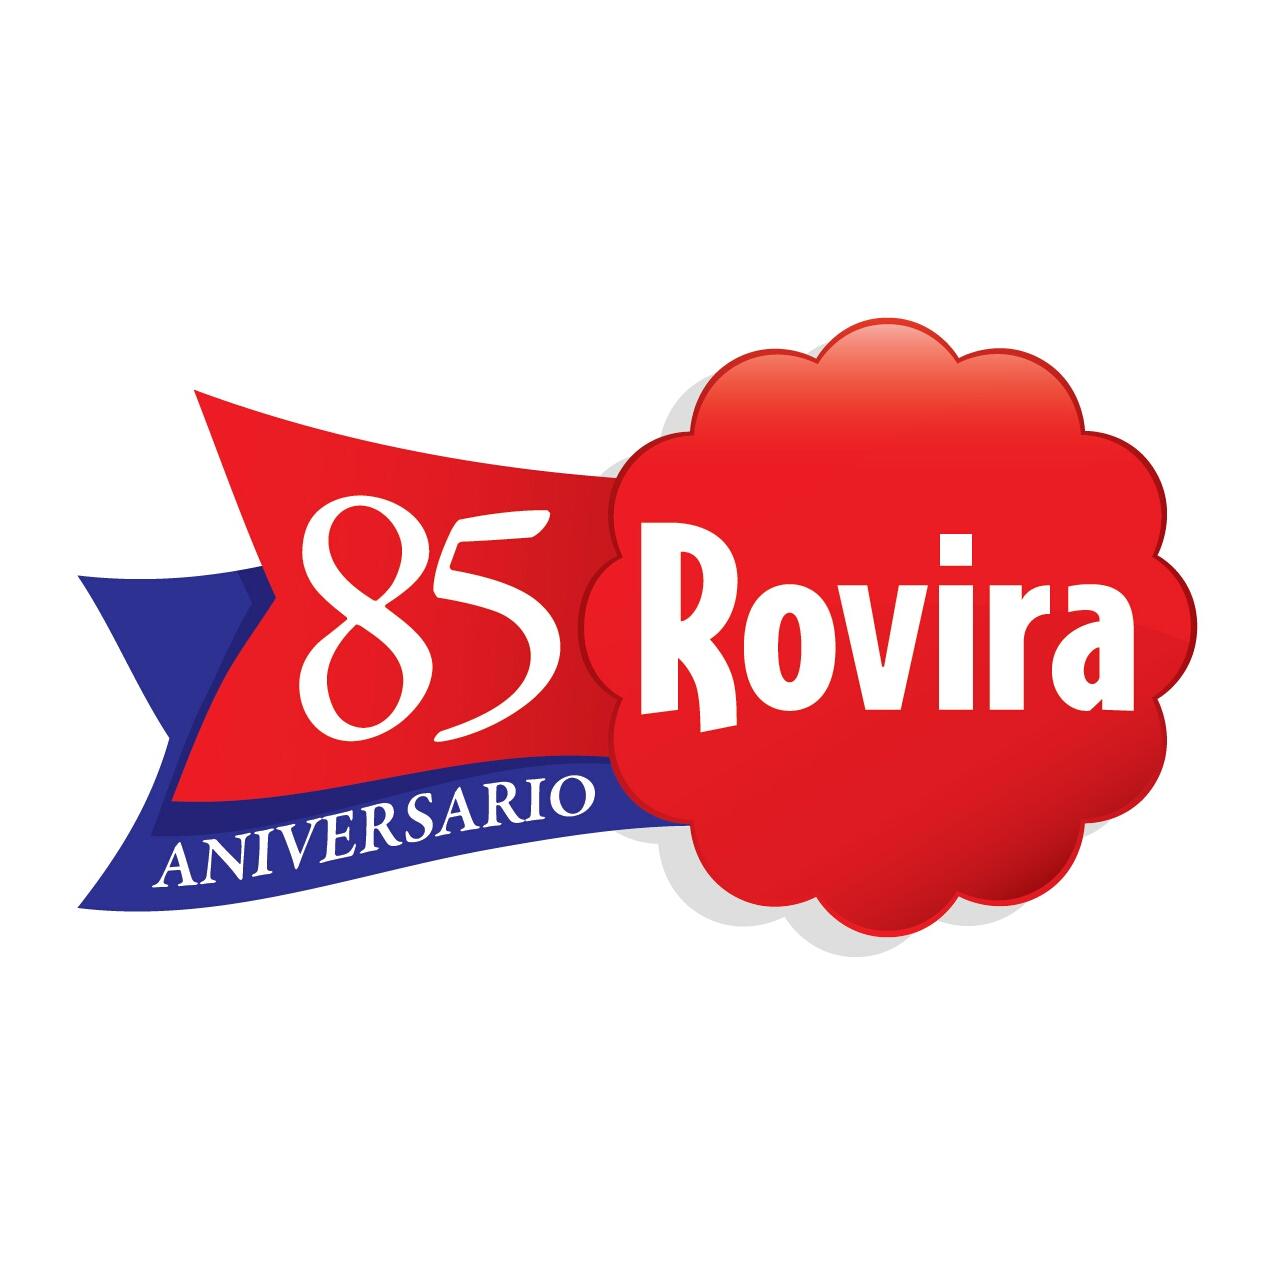 85 años de Rovira